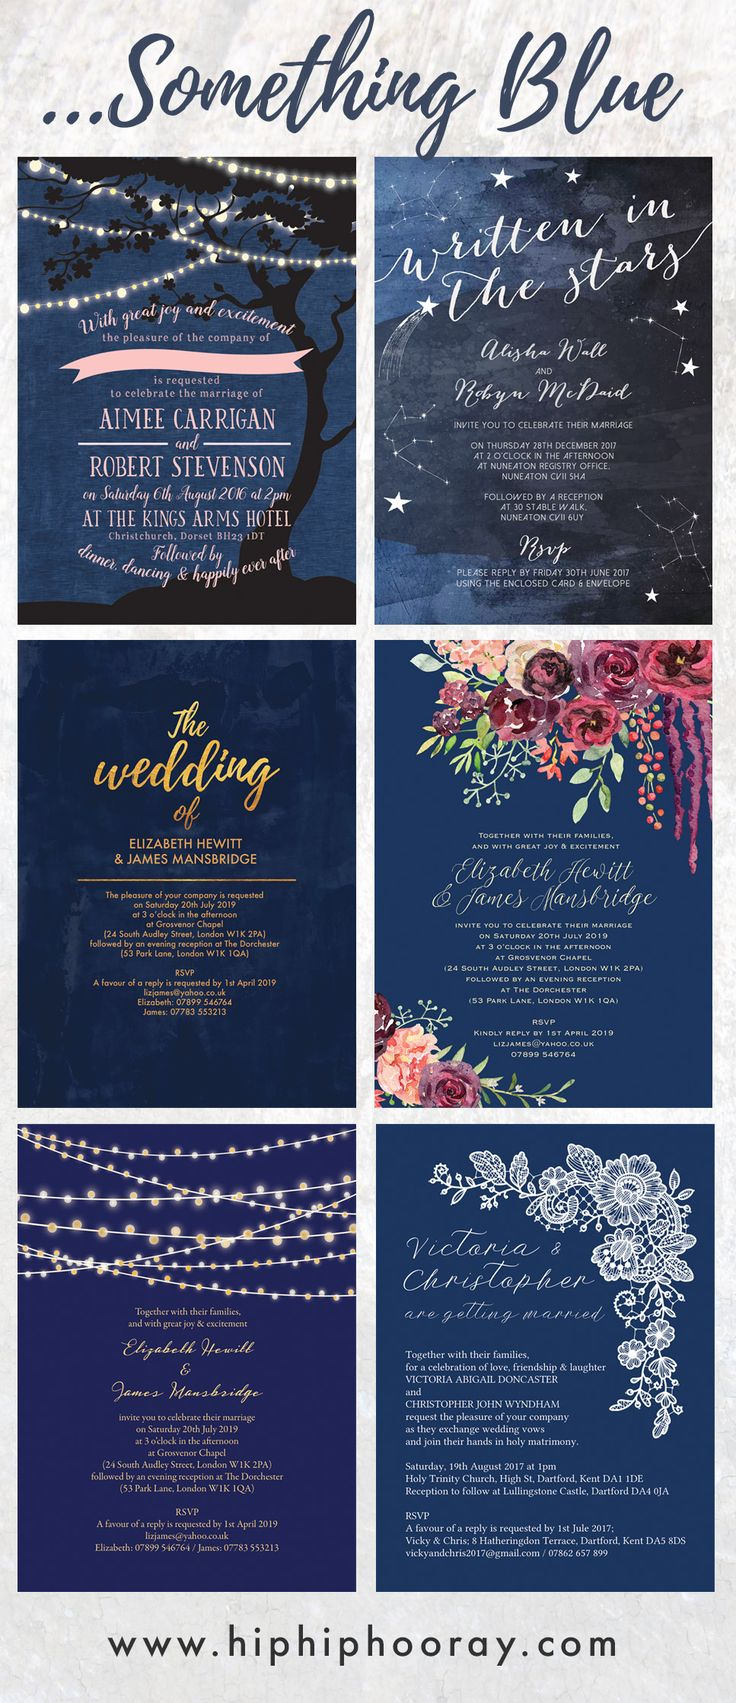 best Brooke Wedding ideas images on Pinterest  Wedding ideas